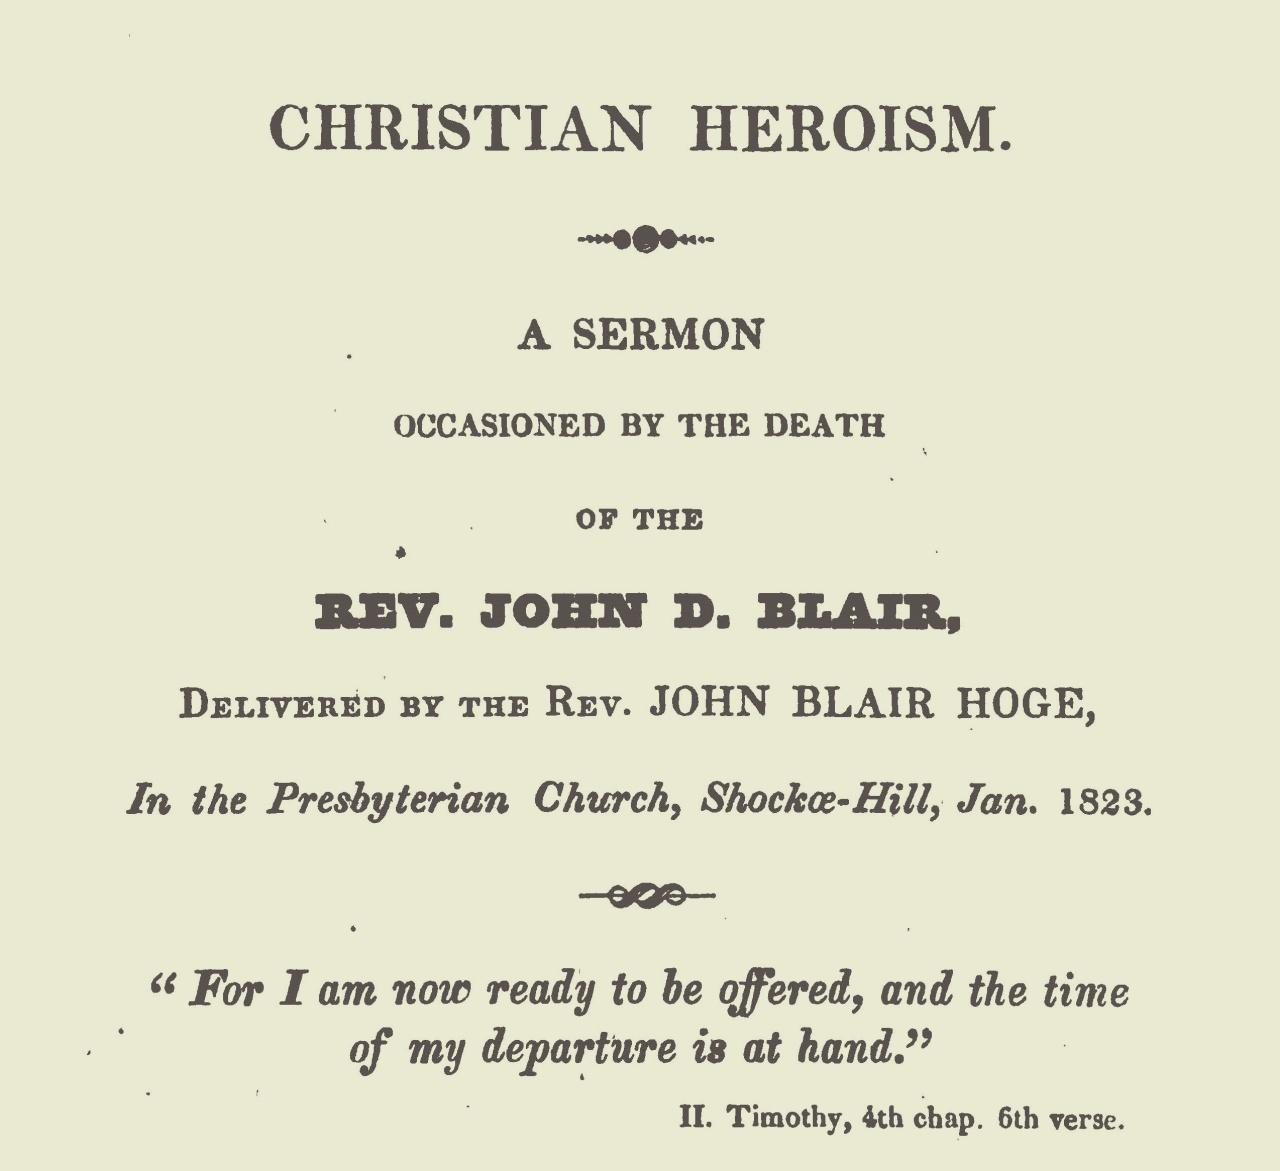 Hoge, Sr., John Blair, Christian Heroism Title Page.jpg